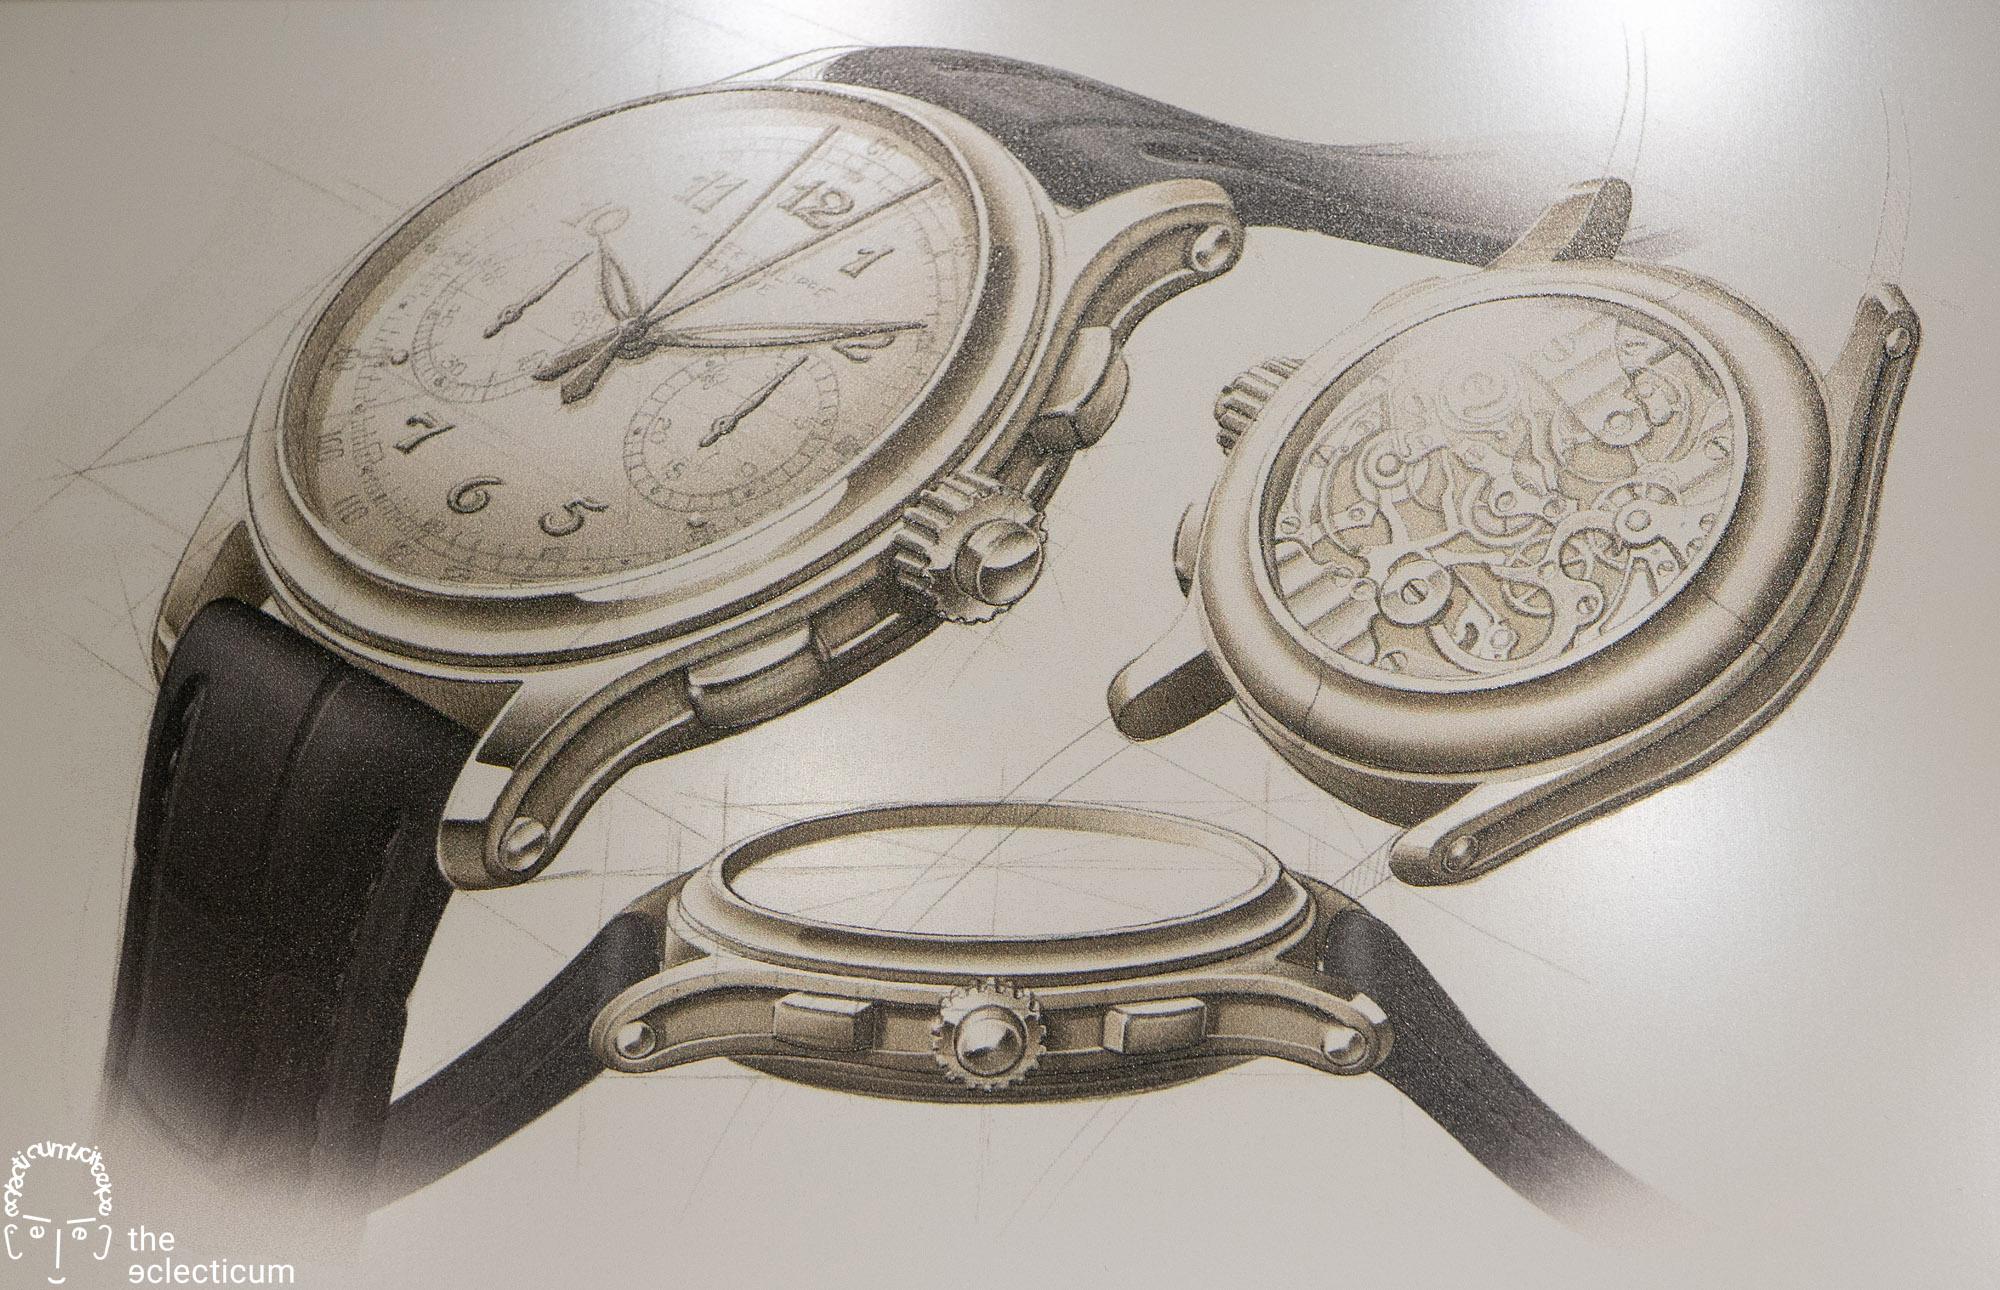 Patek Philippe 5370P Split-Seconds Chronograph design